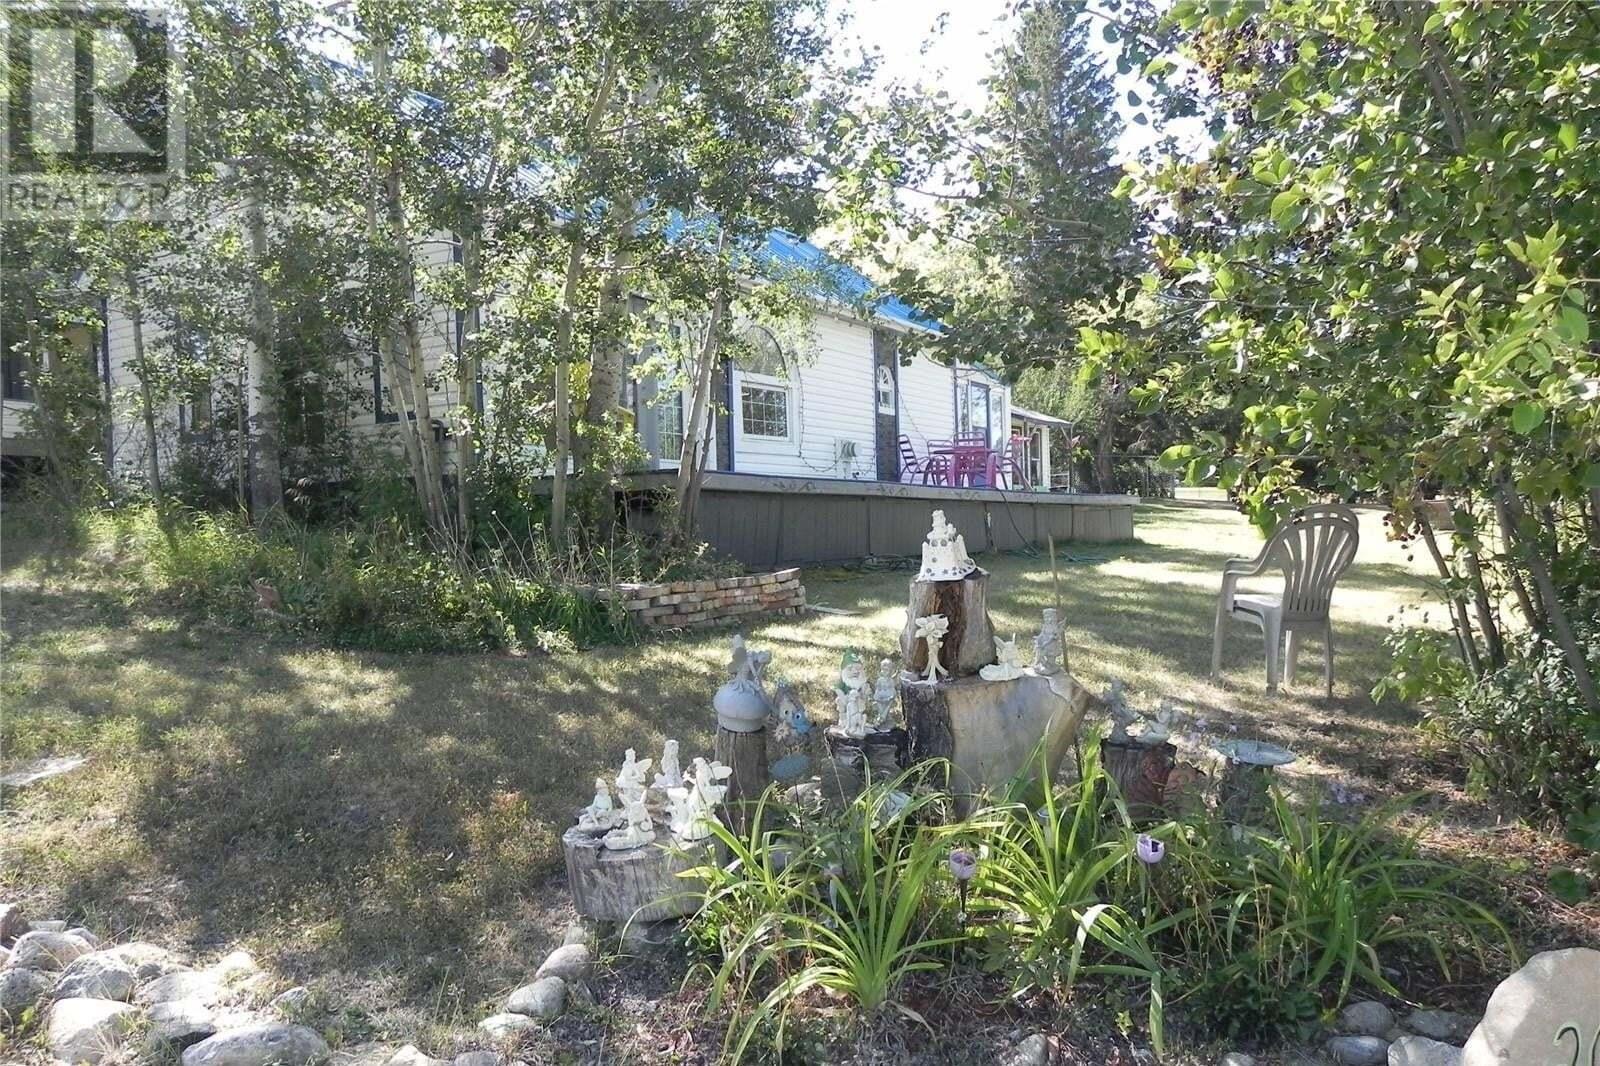 House for sale at 202 Jean St E Manitou Beach Saskatchewan - MLS: SK824391